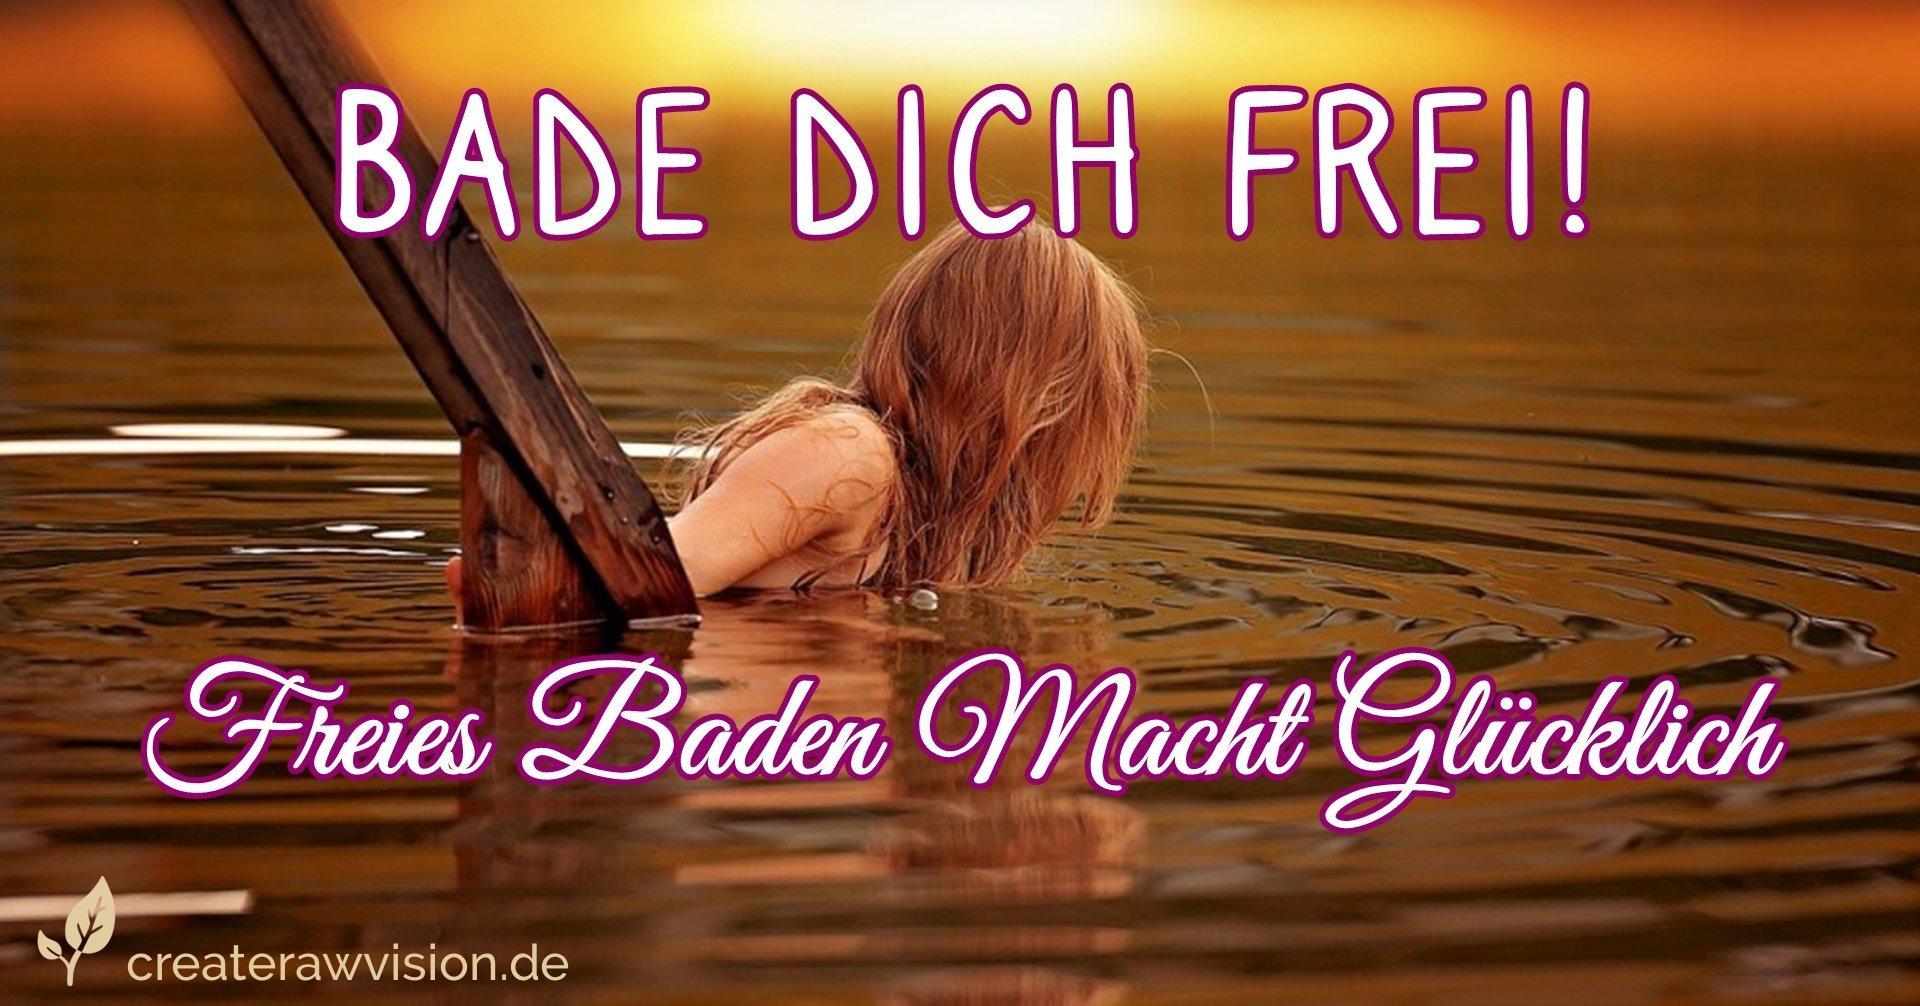 Freies Baden